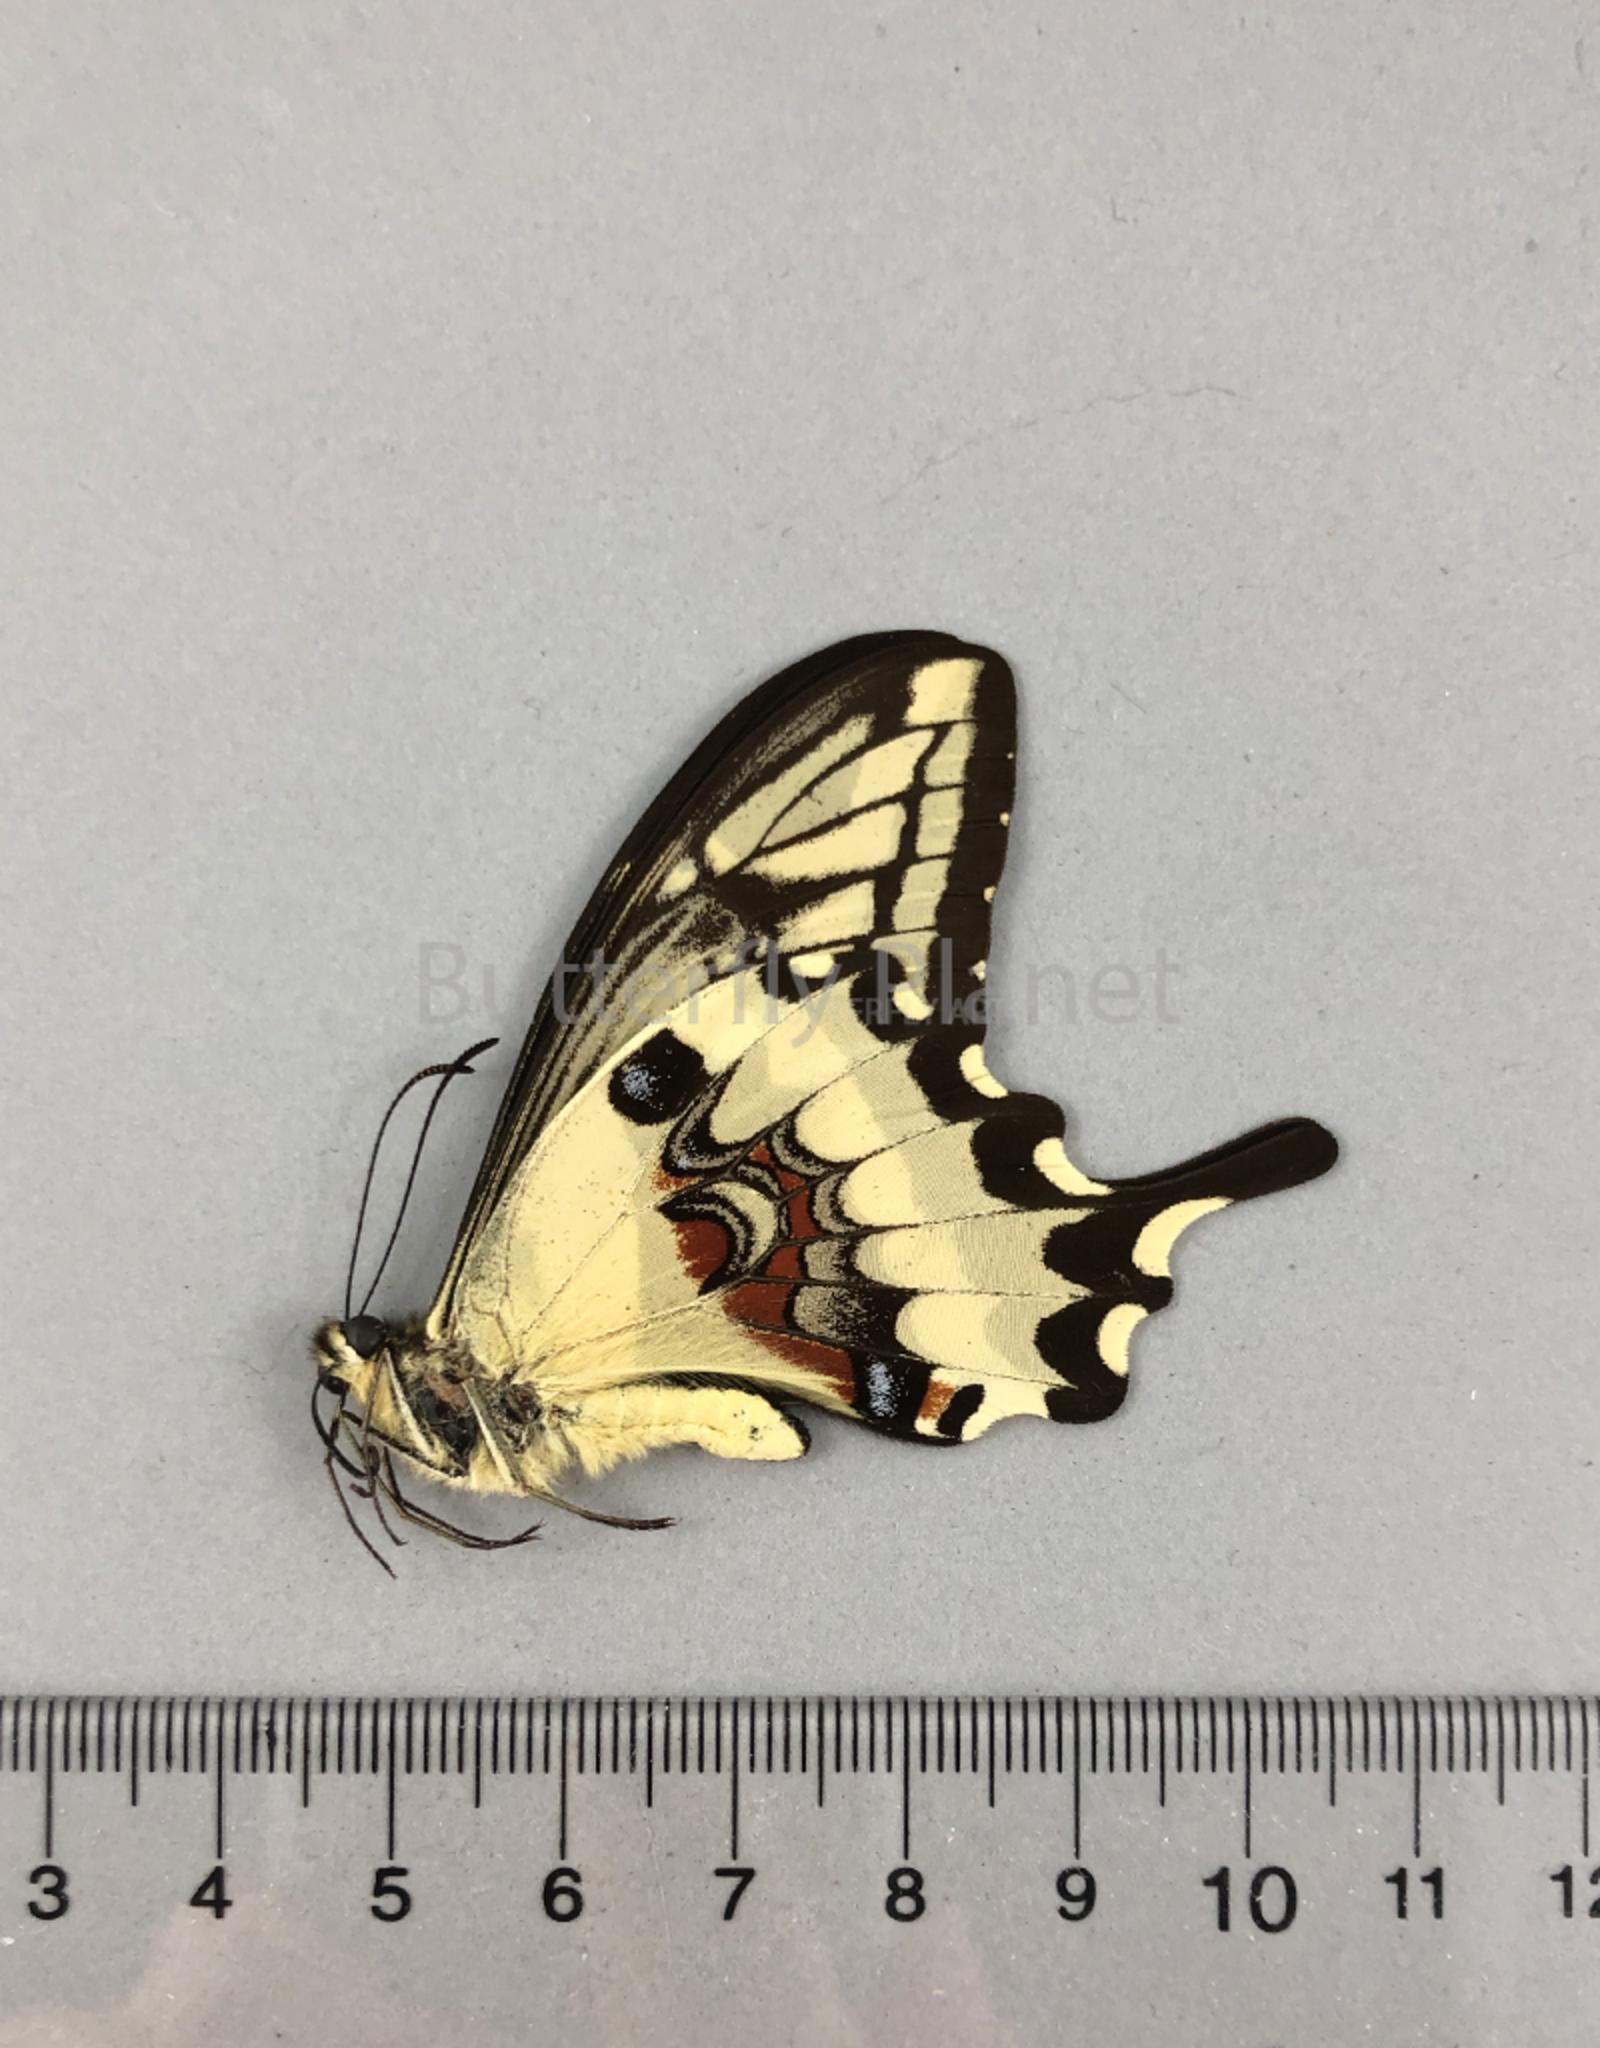 Papilio (Heraclides) paeon escomeli (perugrino) M A1 UHV, Peru